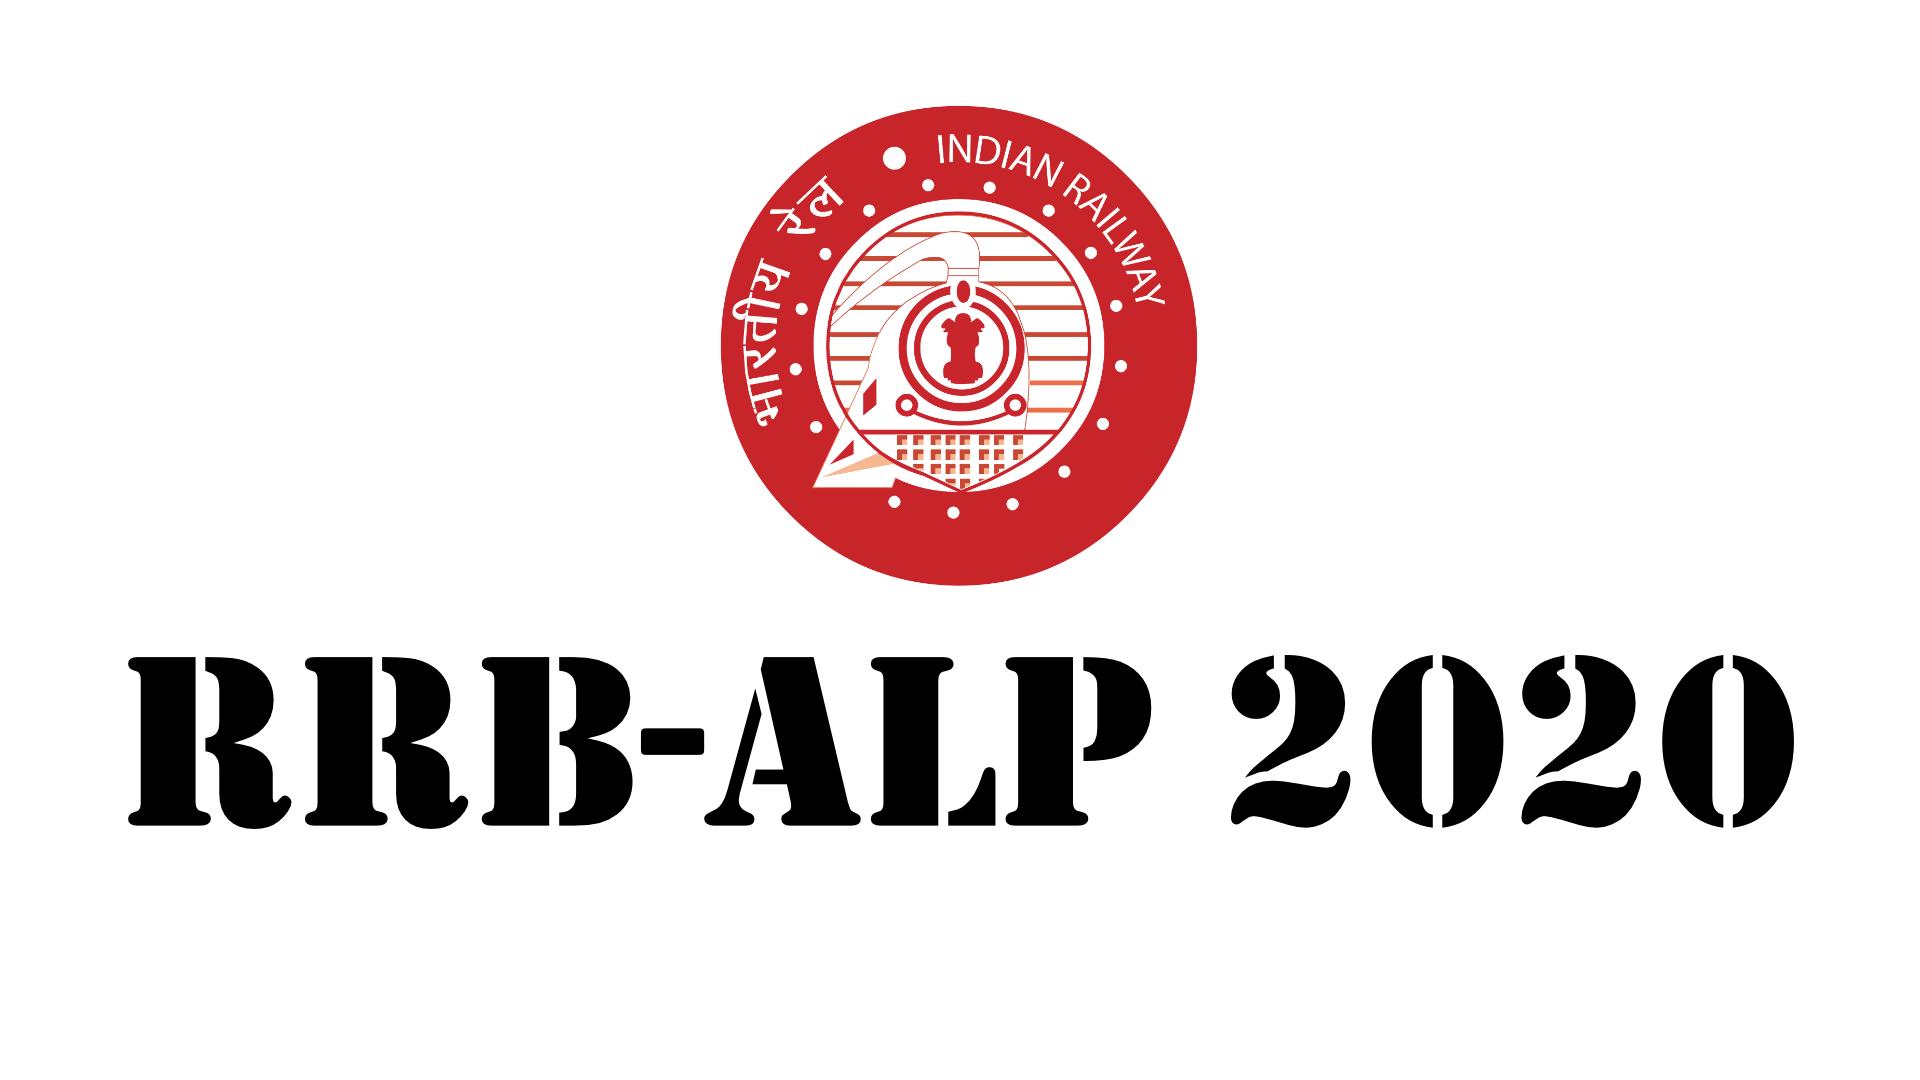 RRB ALP 2020